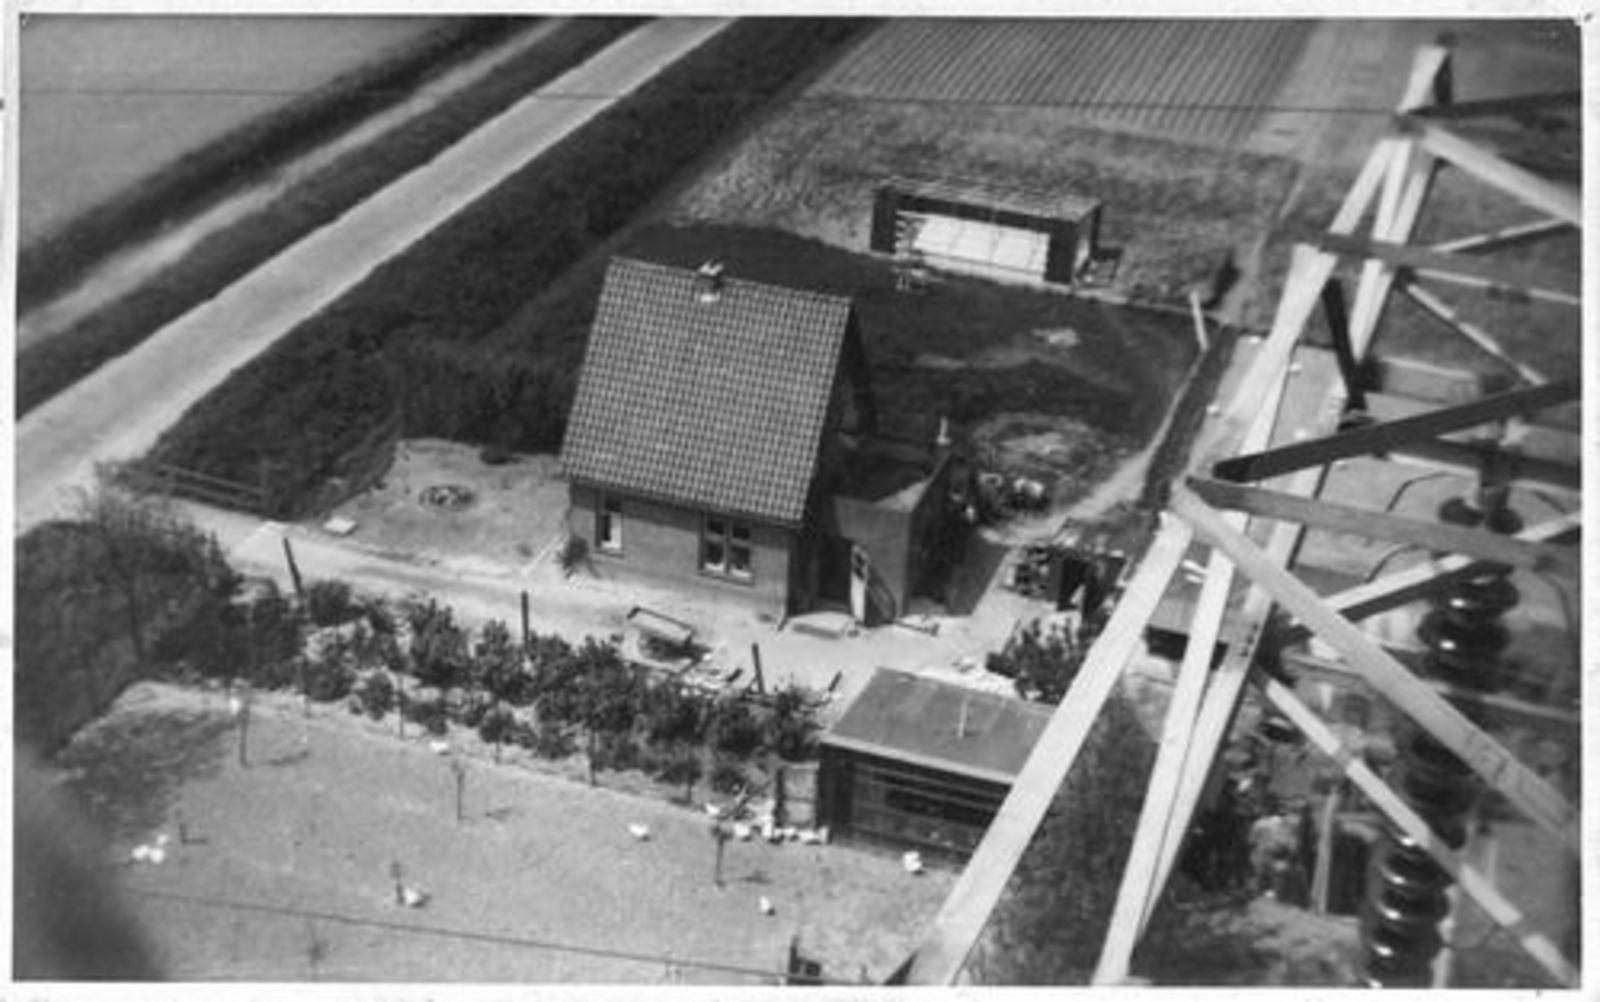 Vijfhuizerweg N 0781 1949 Our Desire